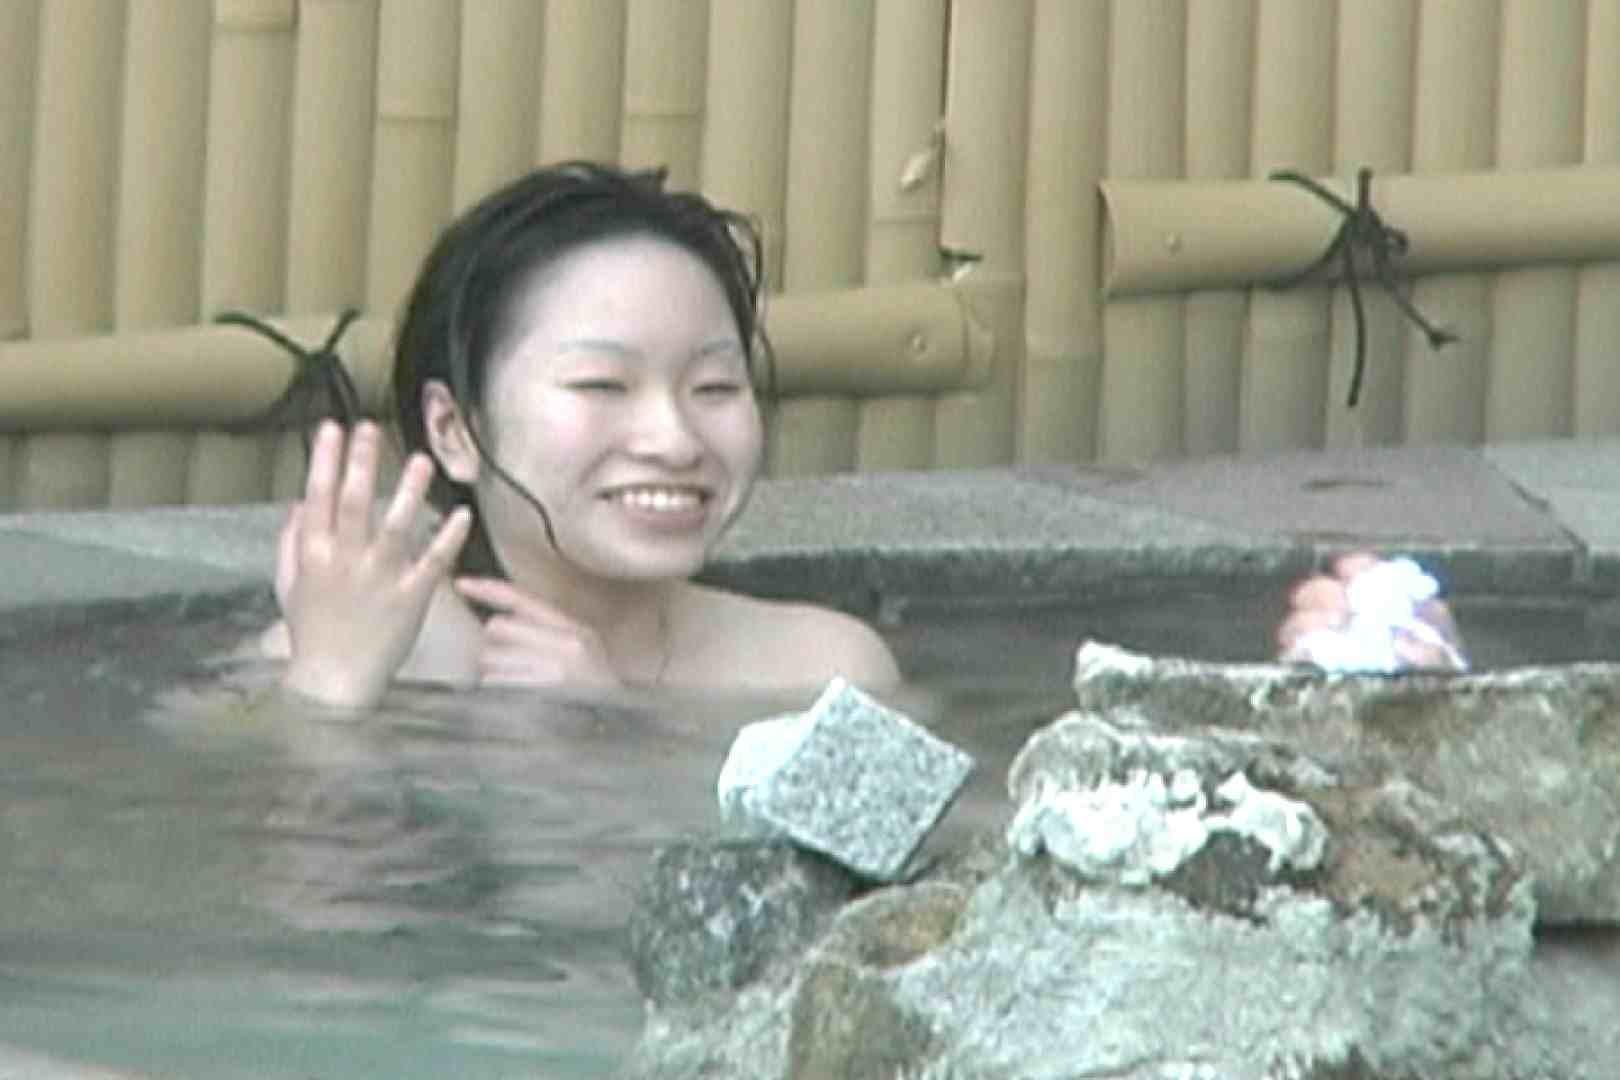 Aquaな露天風呂Vol.595 0 | 0  89連発 65